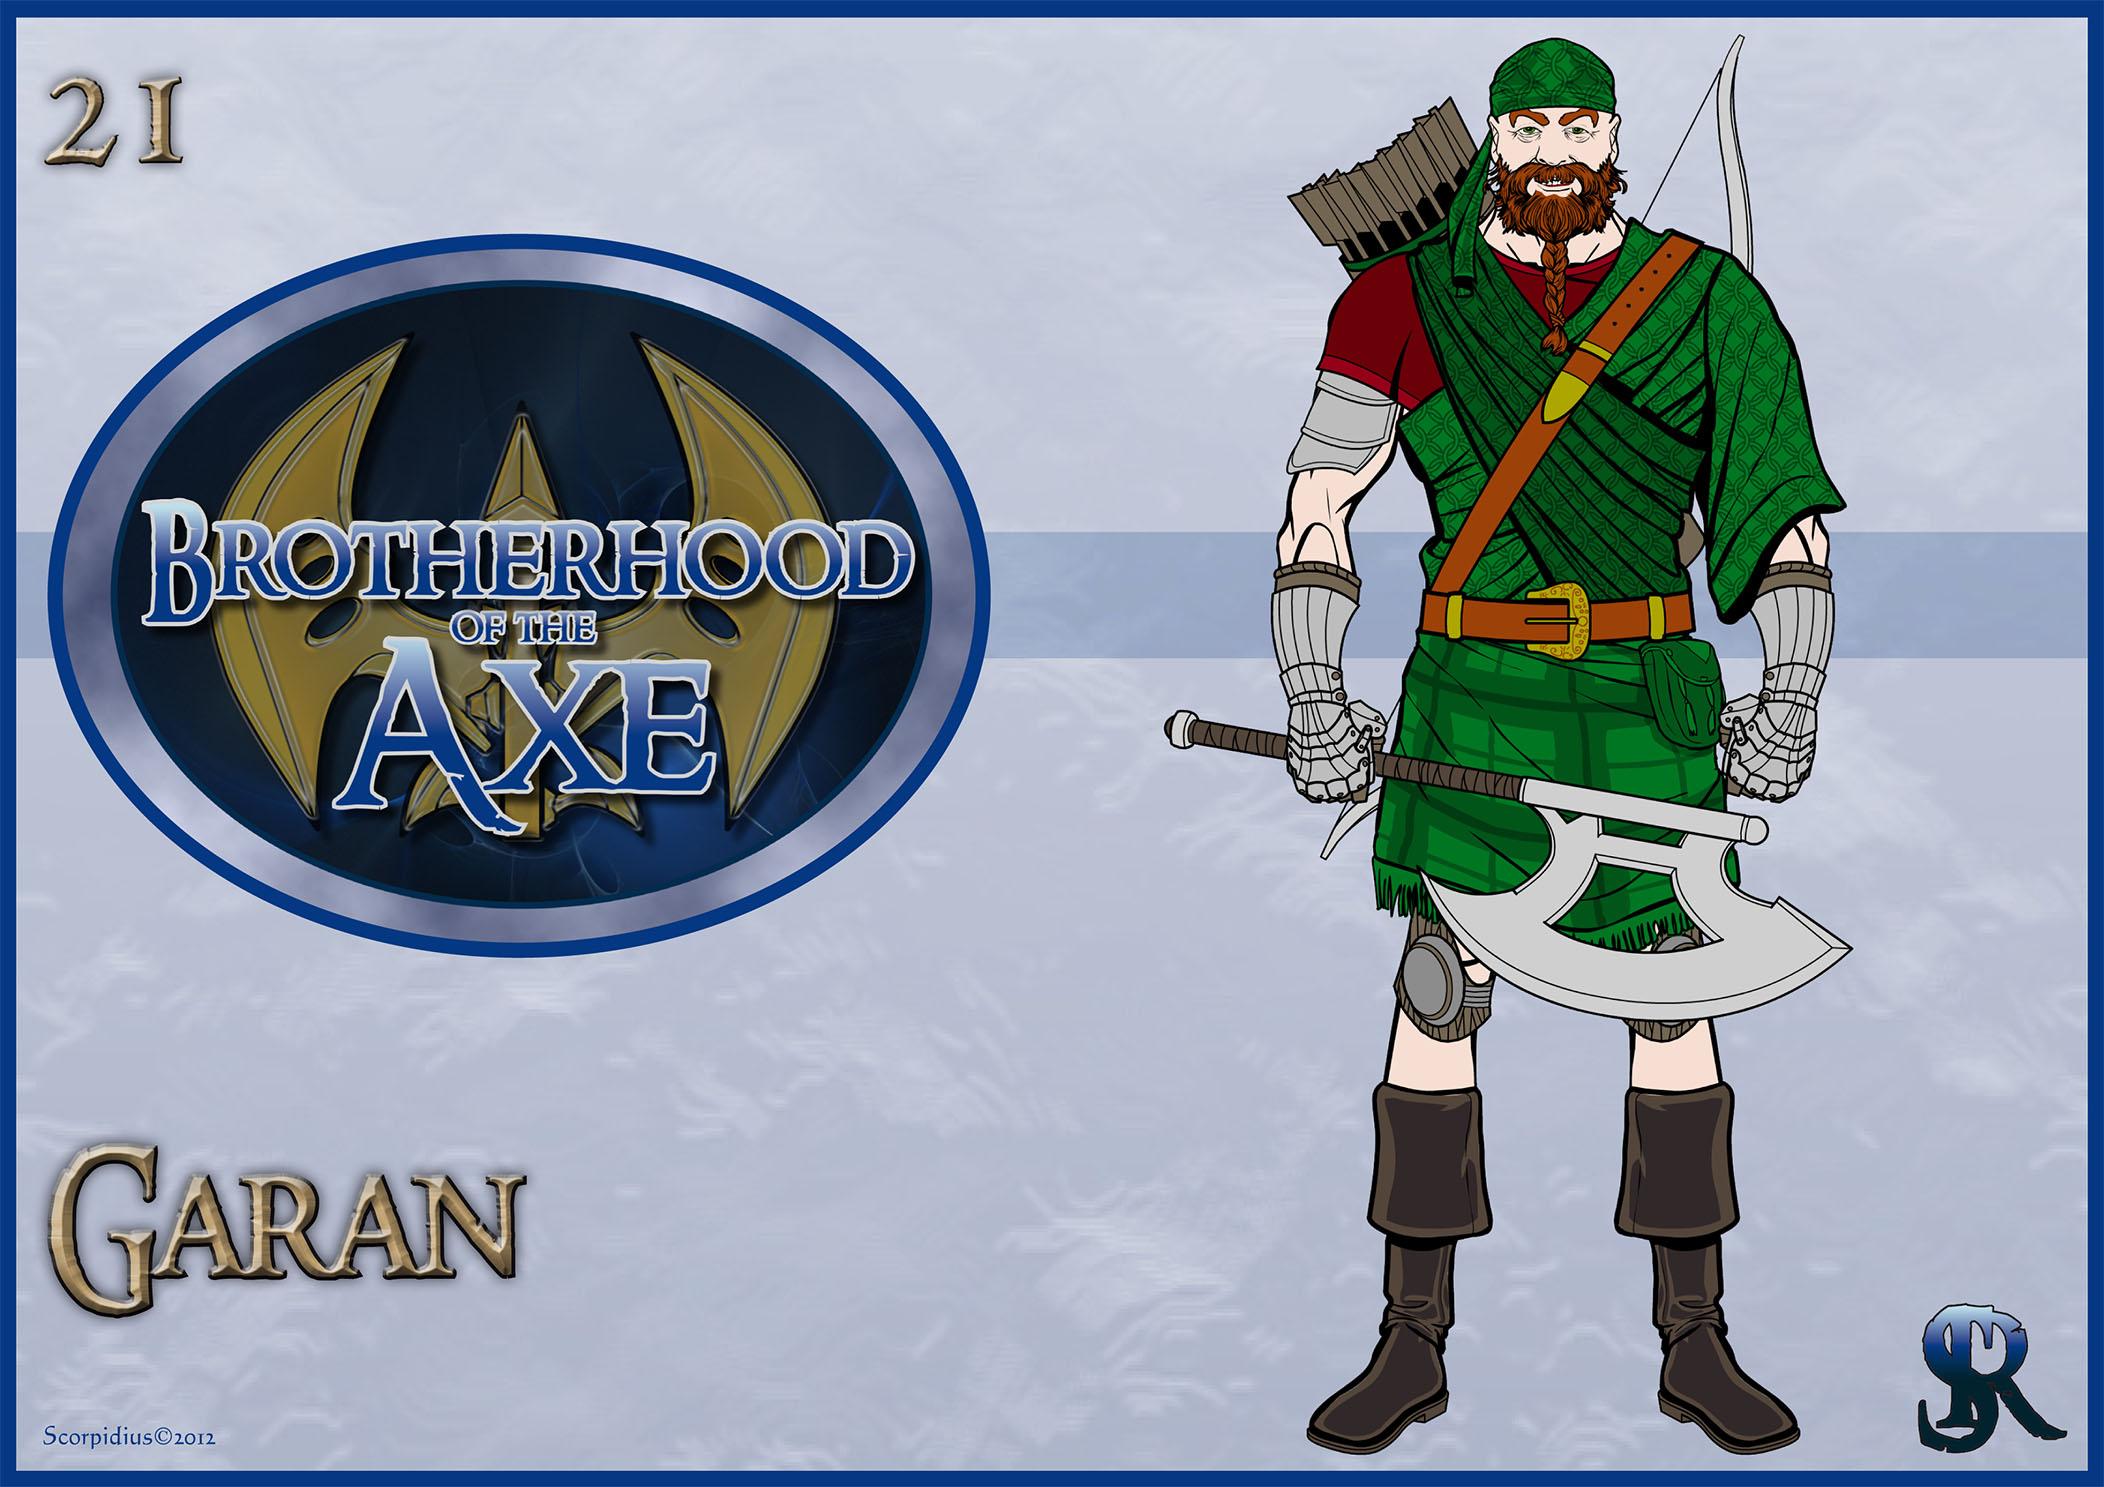 http://www.heromachine.com/wp-content/legacy/forum-image-uploads/scorpidius/2012/03/021-Garan.jpg